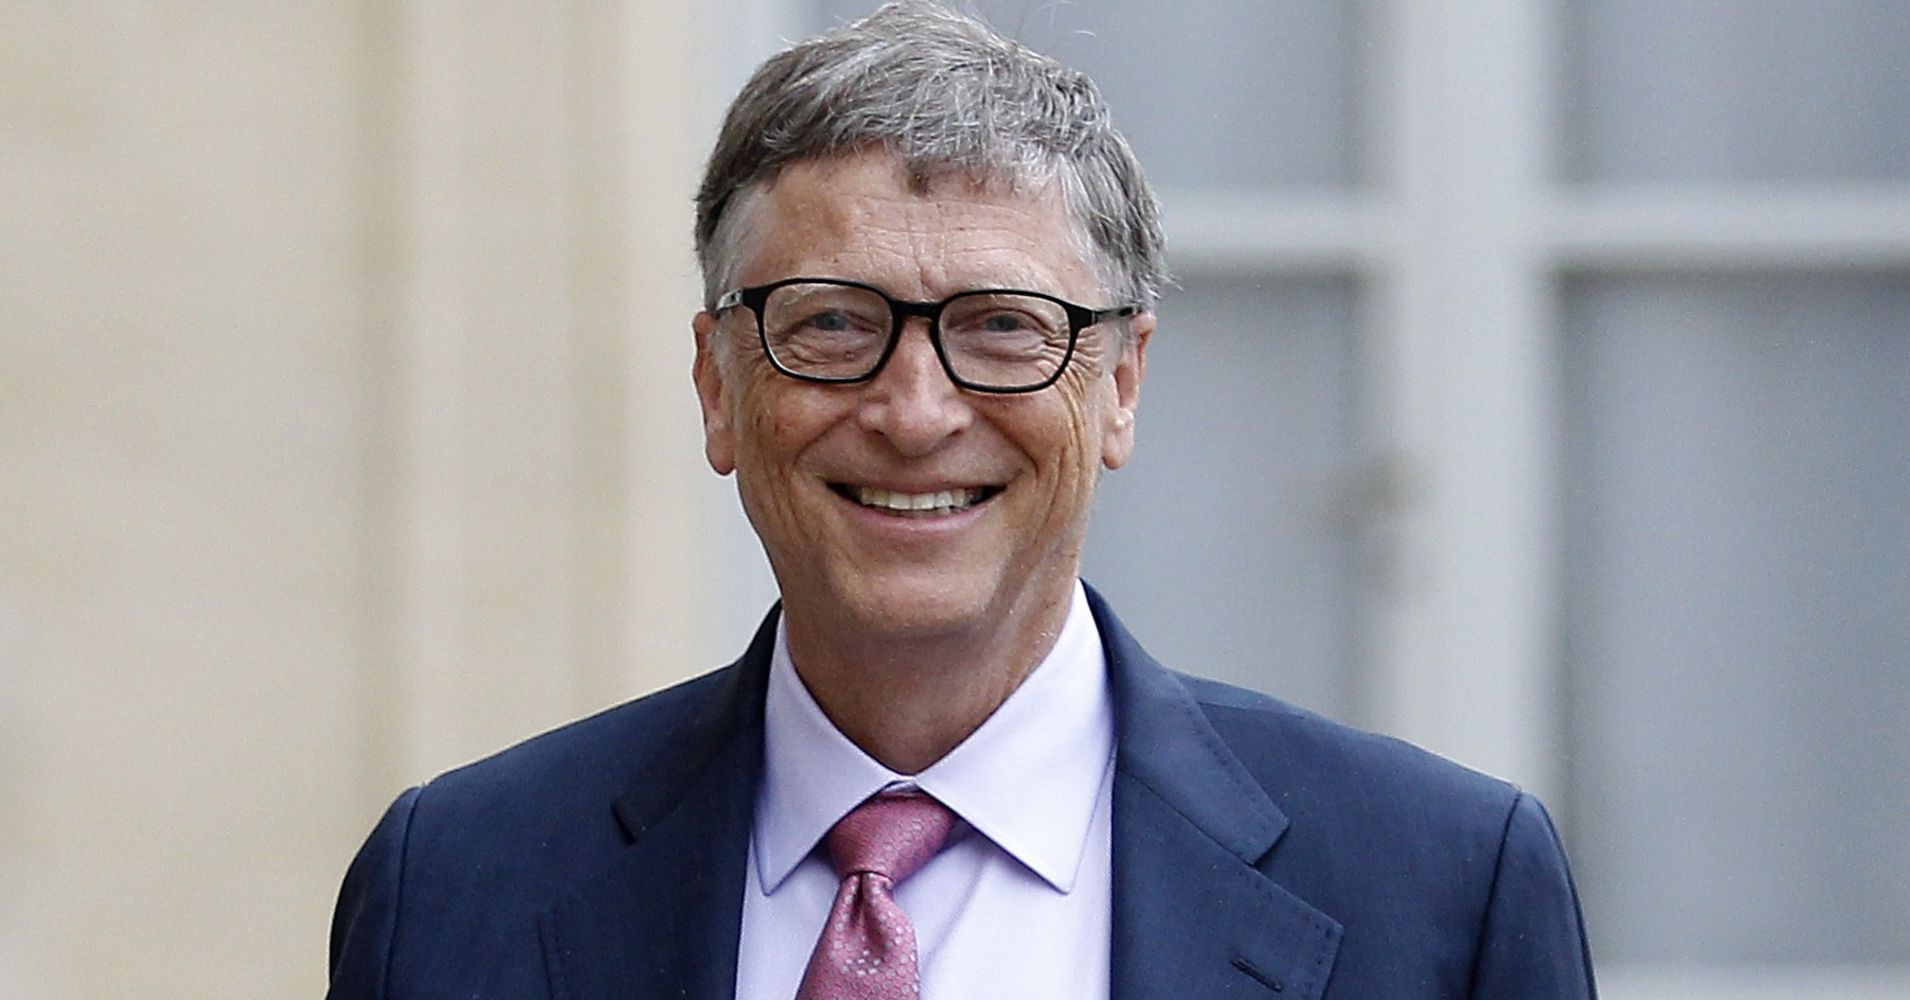 Tỷ phú Bill Gates. Nguồn: CNBC.com